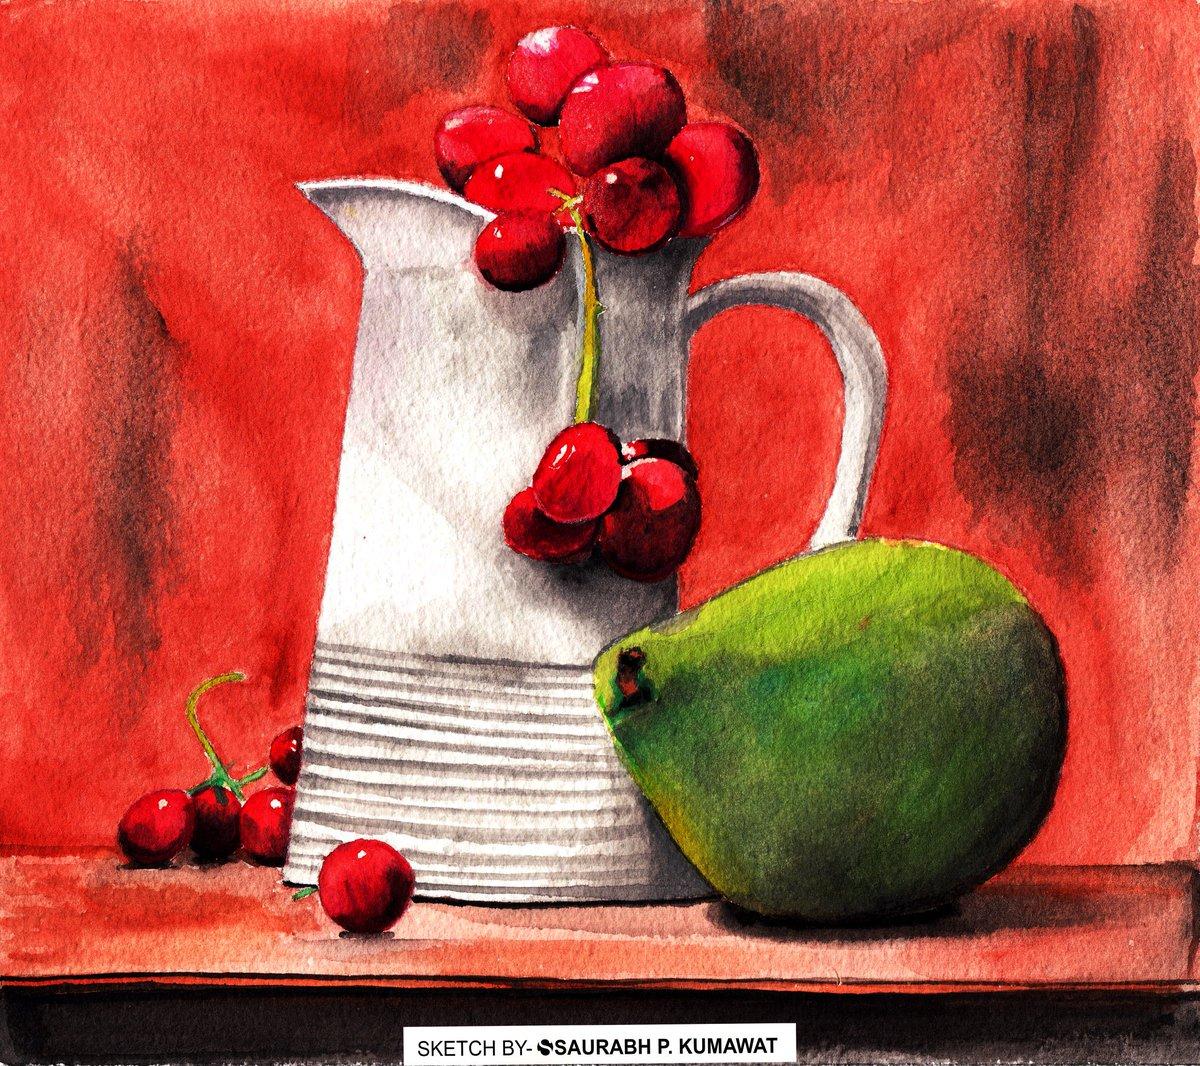 Still life watercolour painting. #stilllife #watercolour #Watercolourpainting #paintingoftheday #drawing #sketching https://t.co/TZbOWugus5